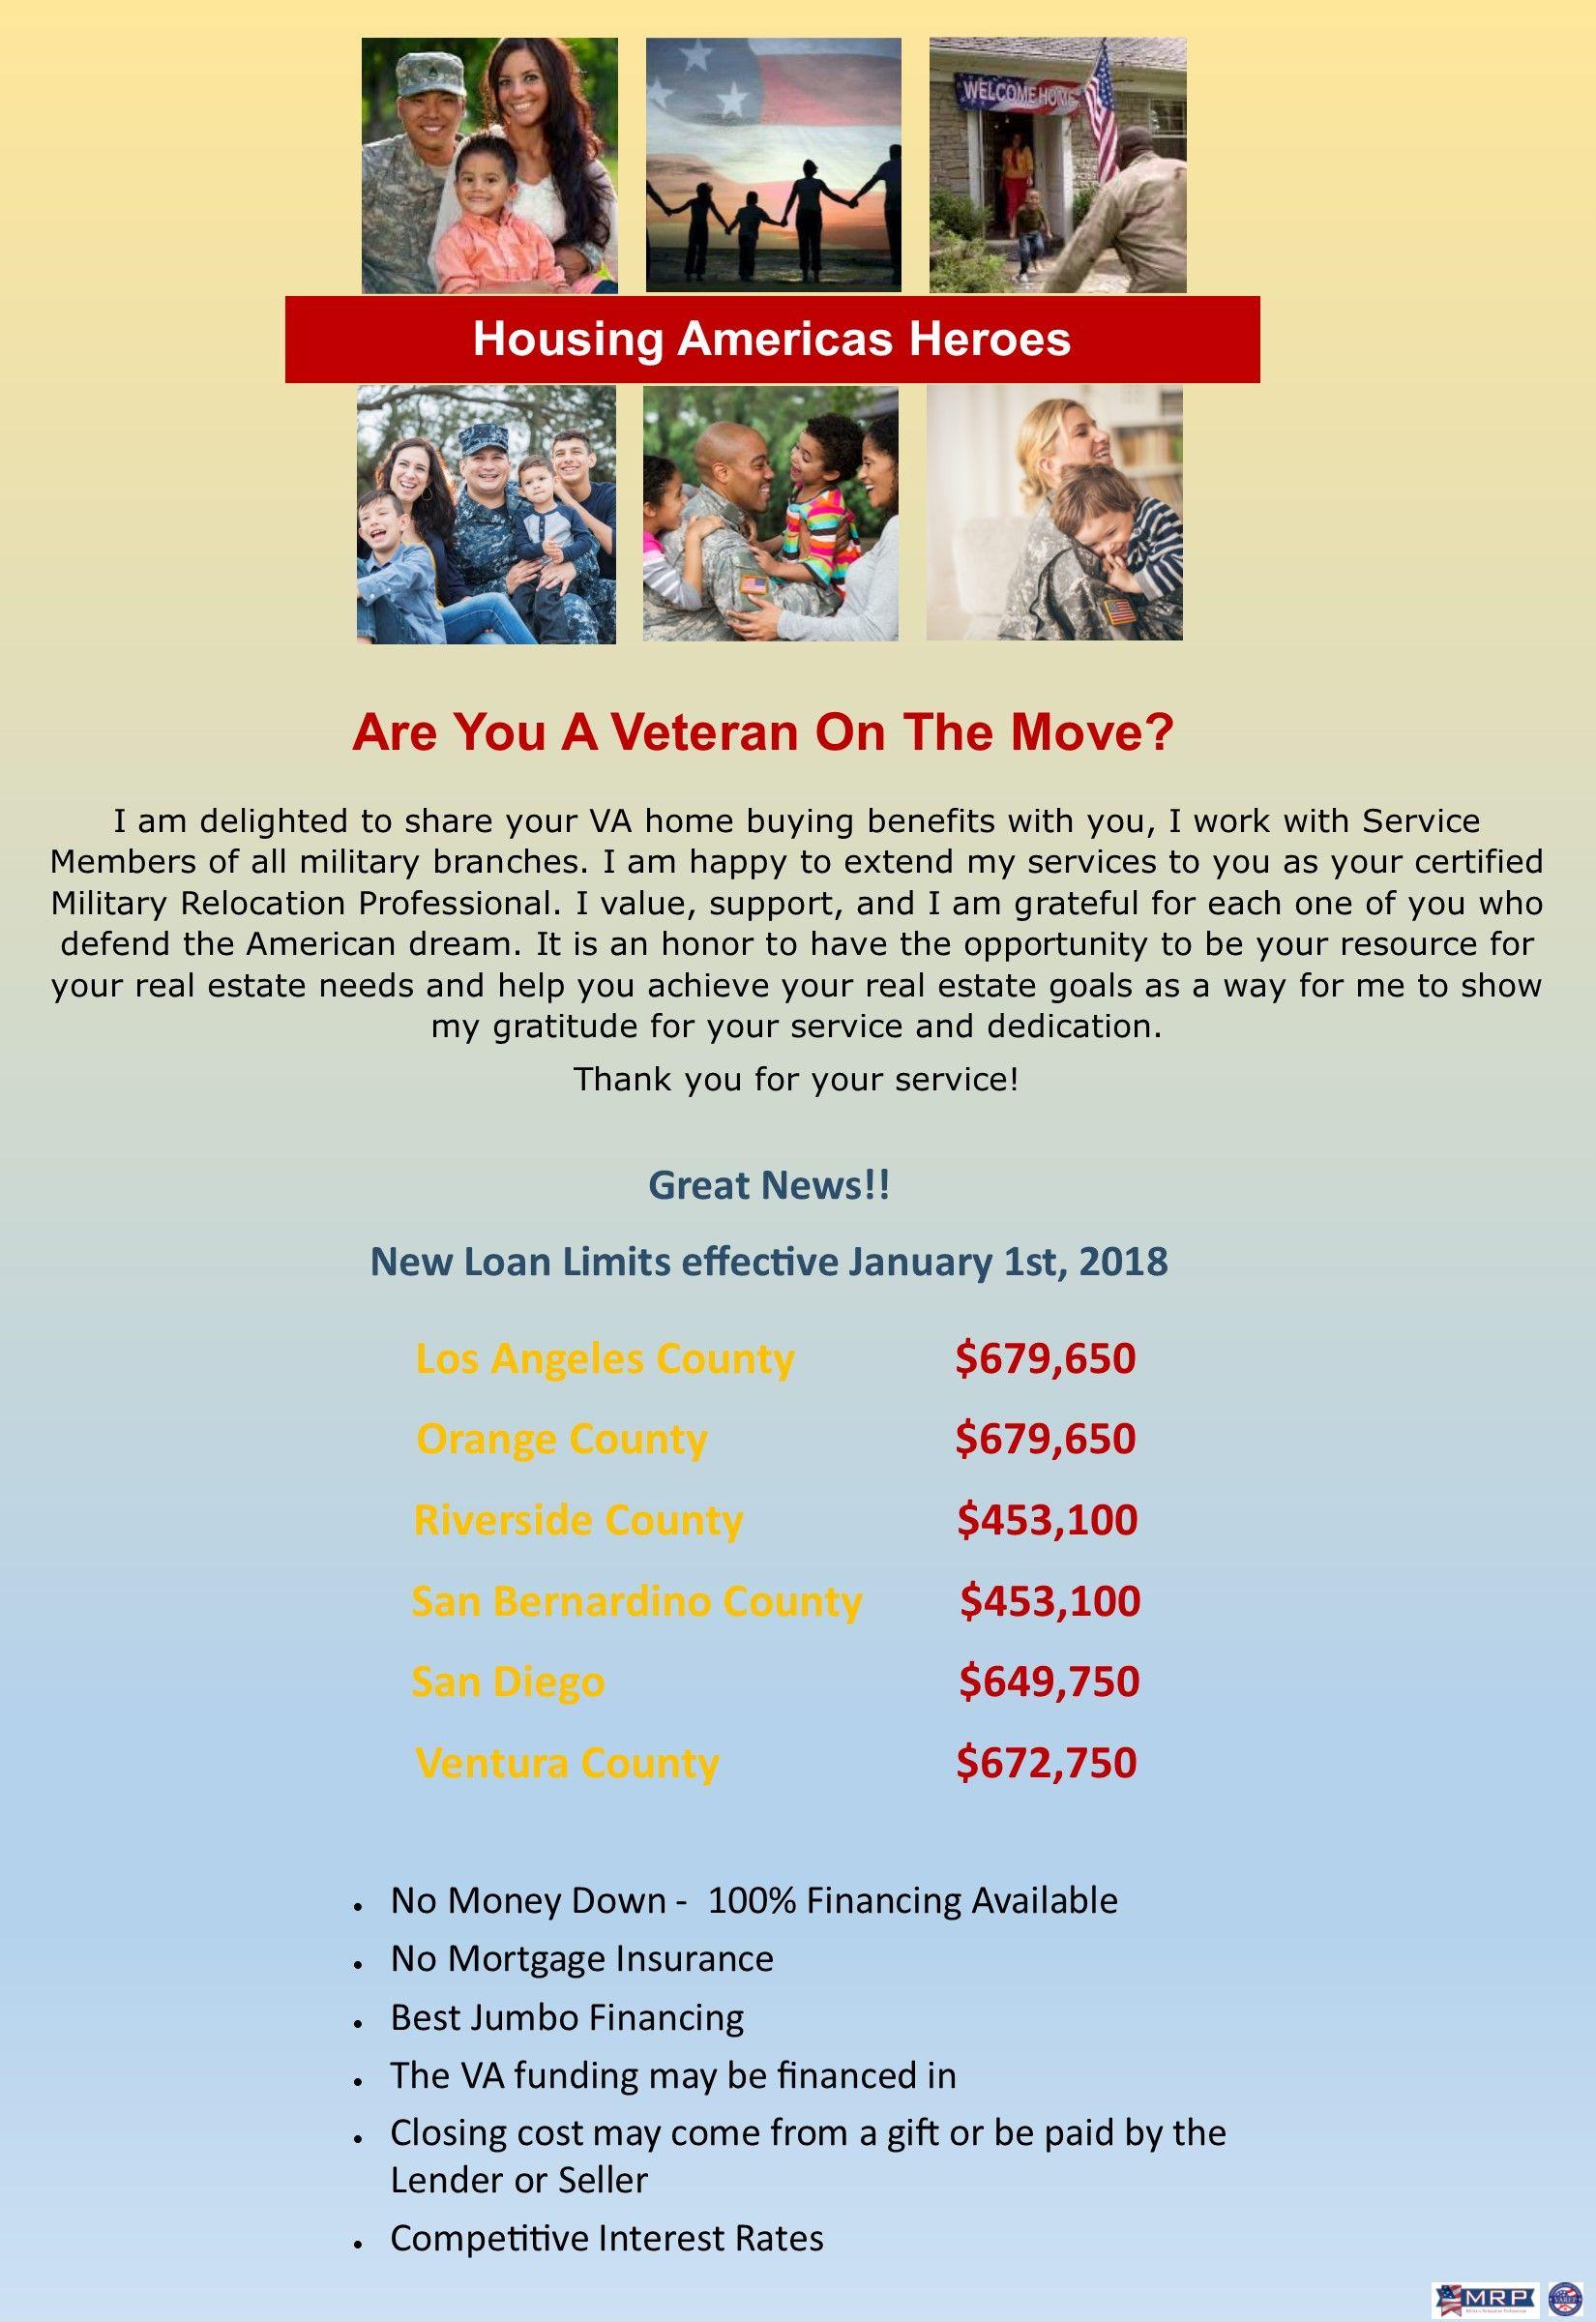 Va loan mortgage calculator usaa